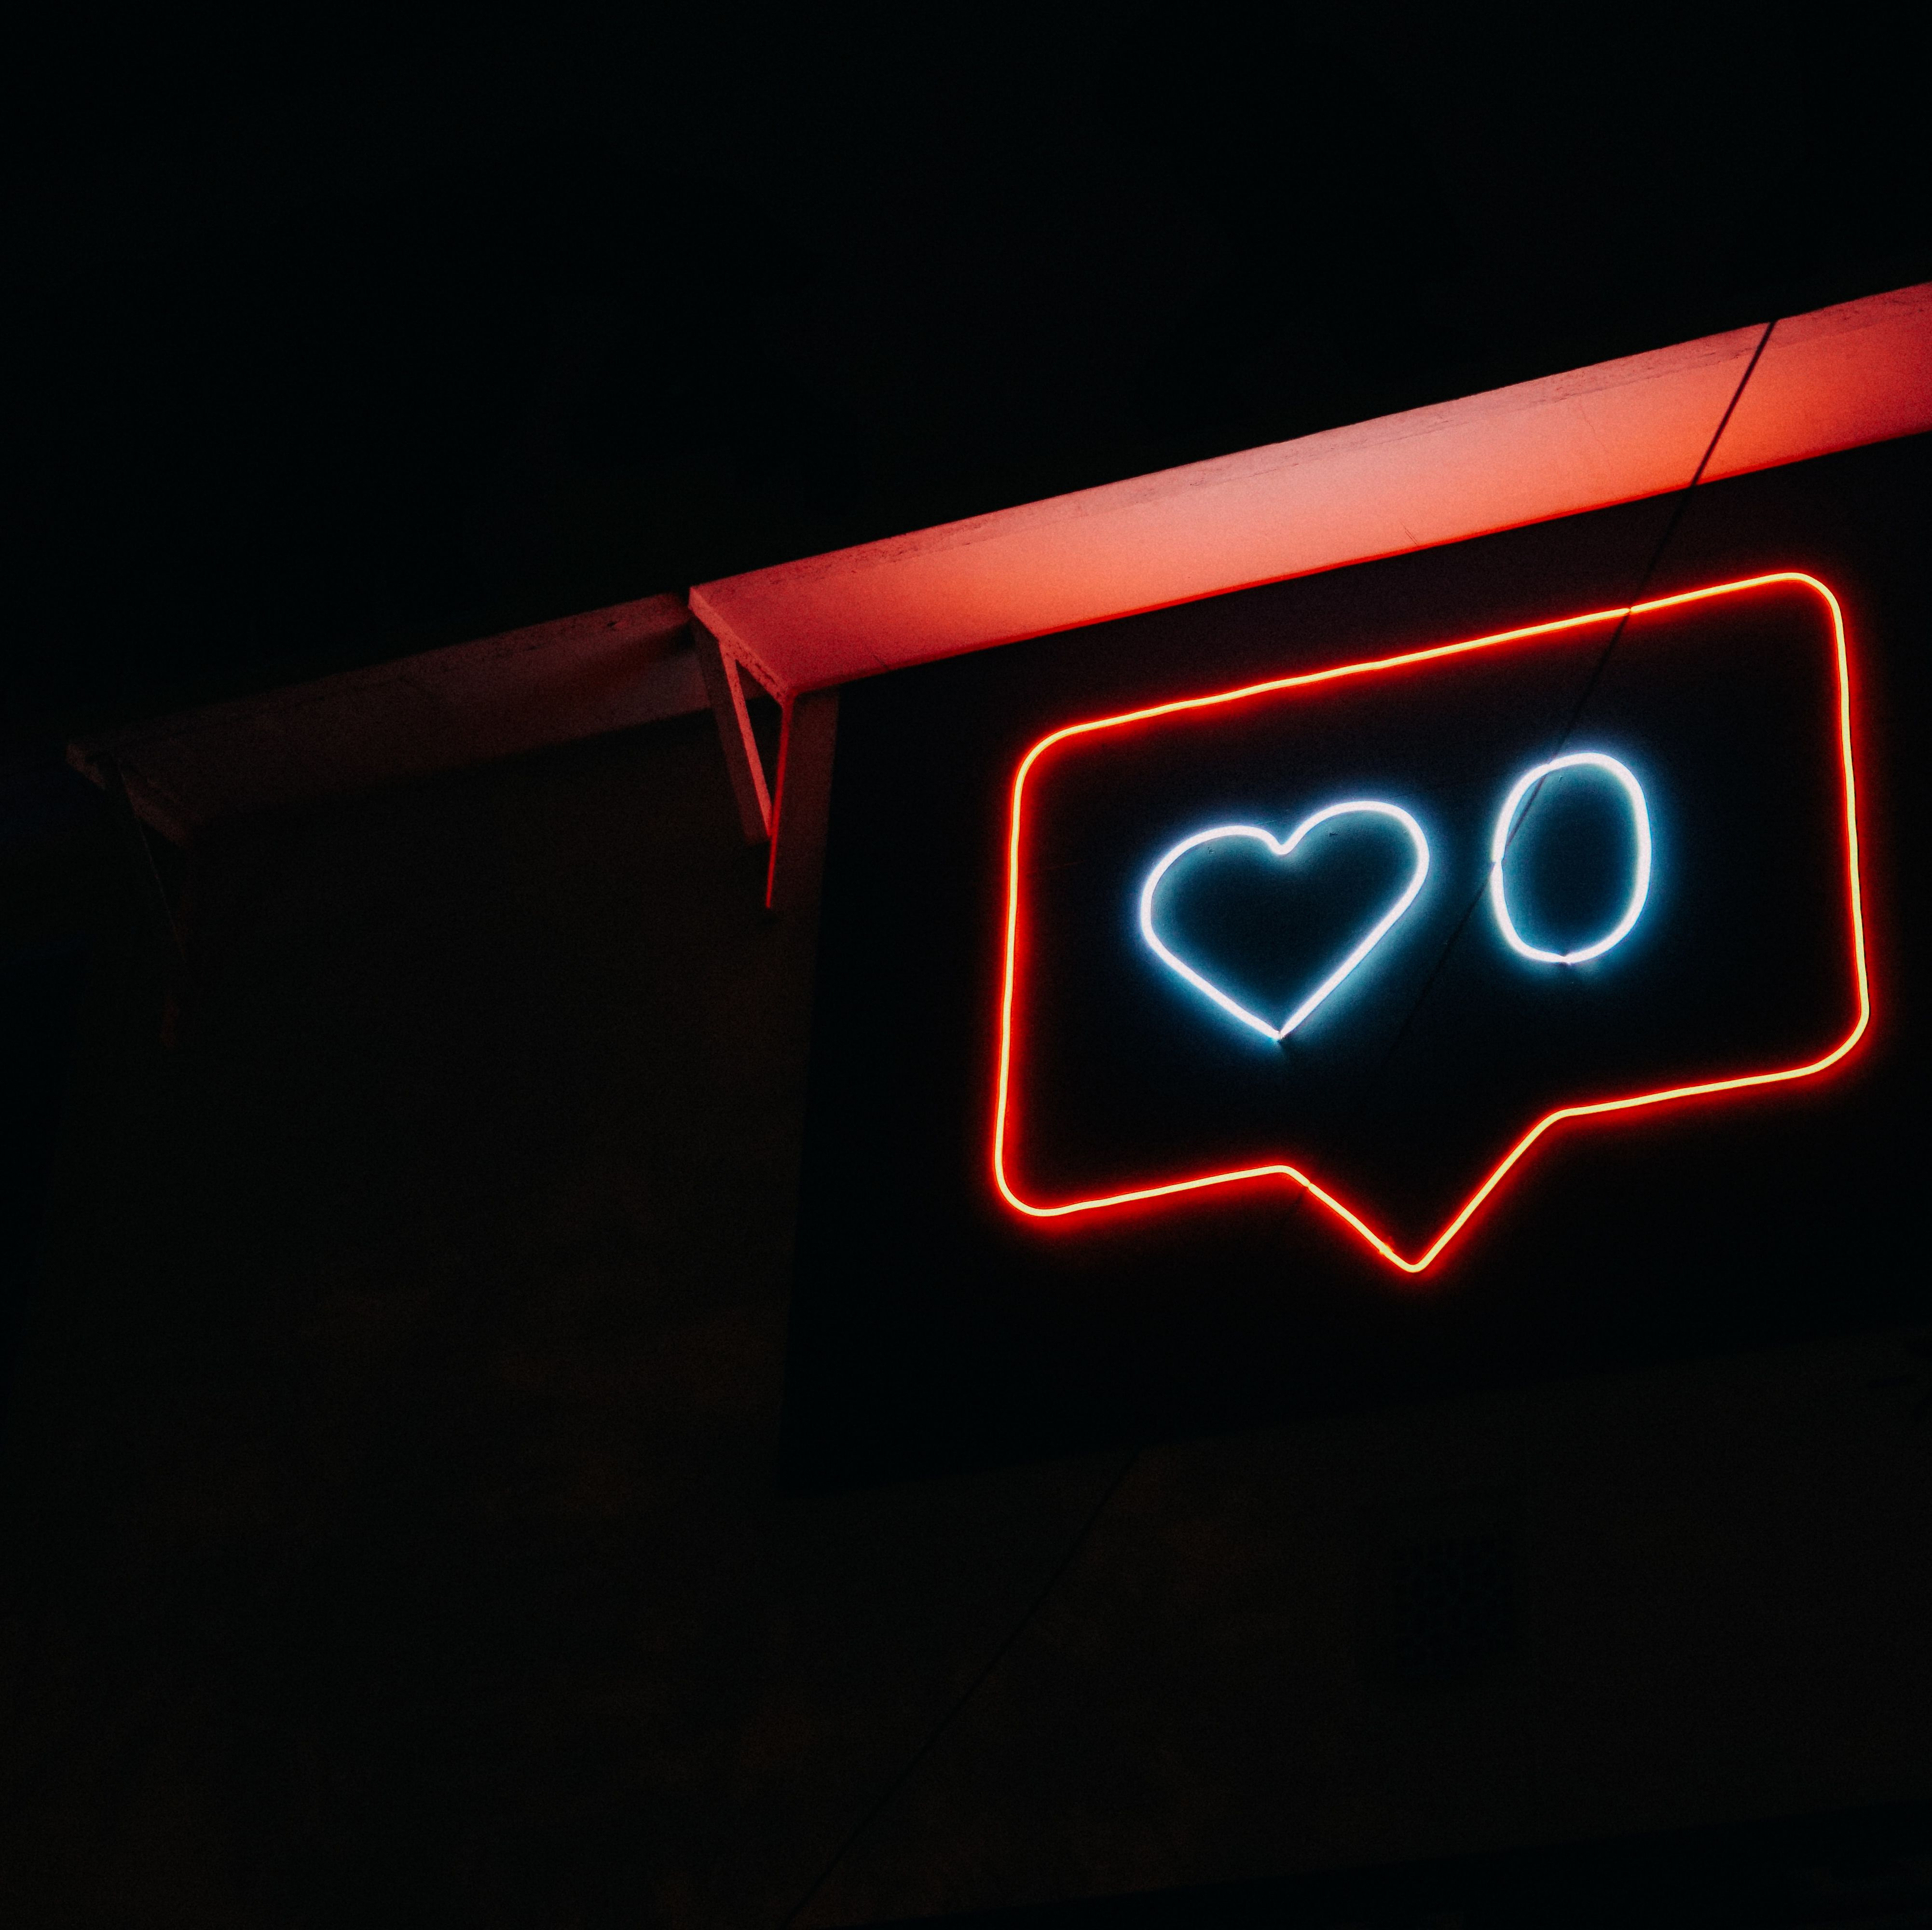 Leitmessen 2019: Social Media und Entscheider-ansprache|https://pluecom.de/wp-content/uploads/2019/11/PLÜCOM-Autorenbeitrag-Messetrends-2019.pdf